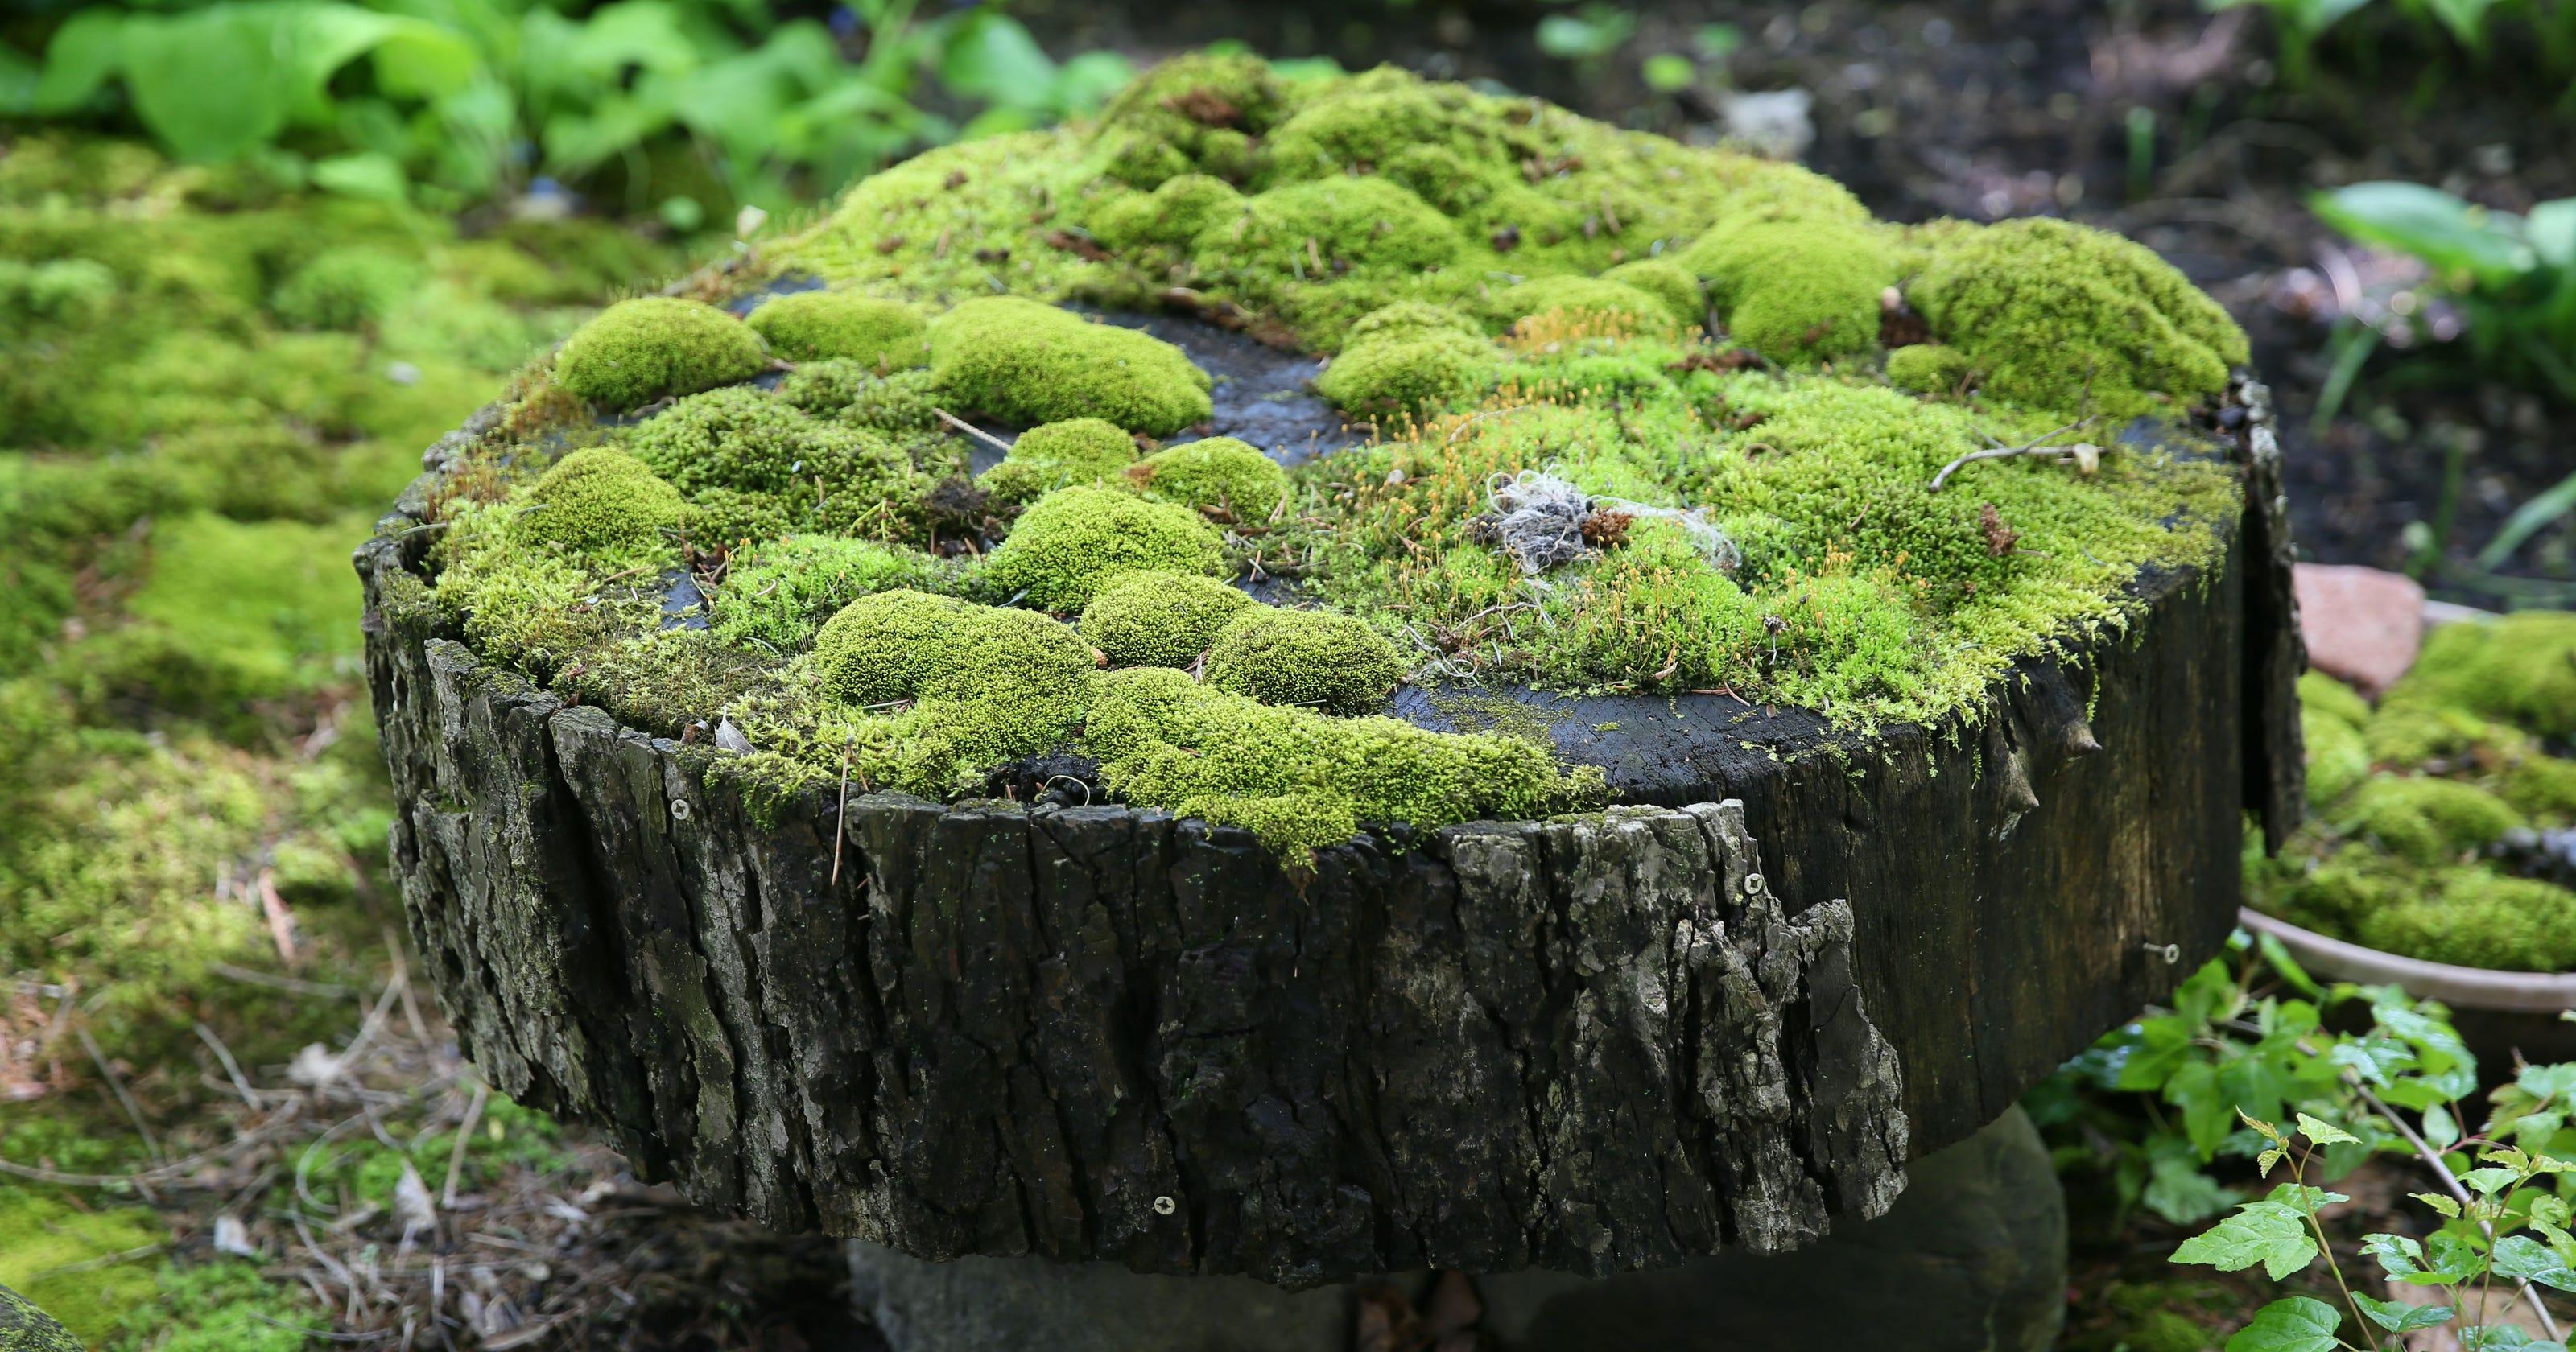 Carpet Of Green Moss Covered Garden Creates A Vivid Landscape